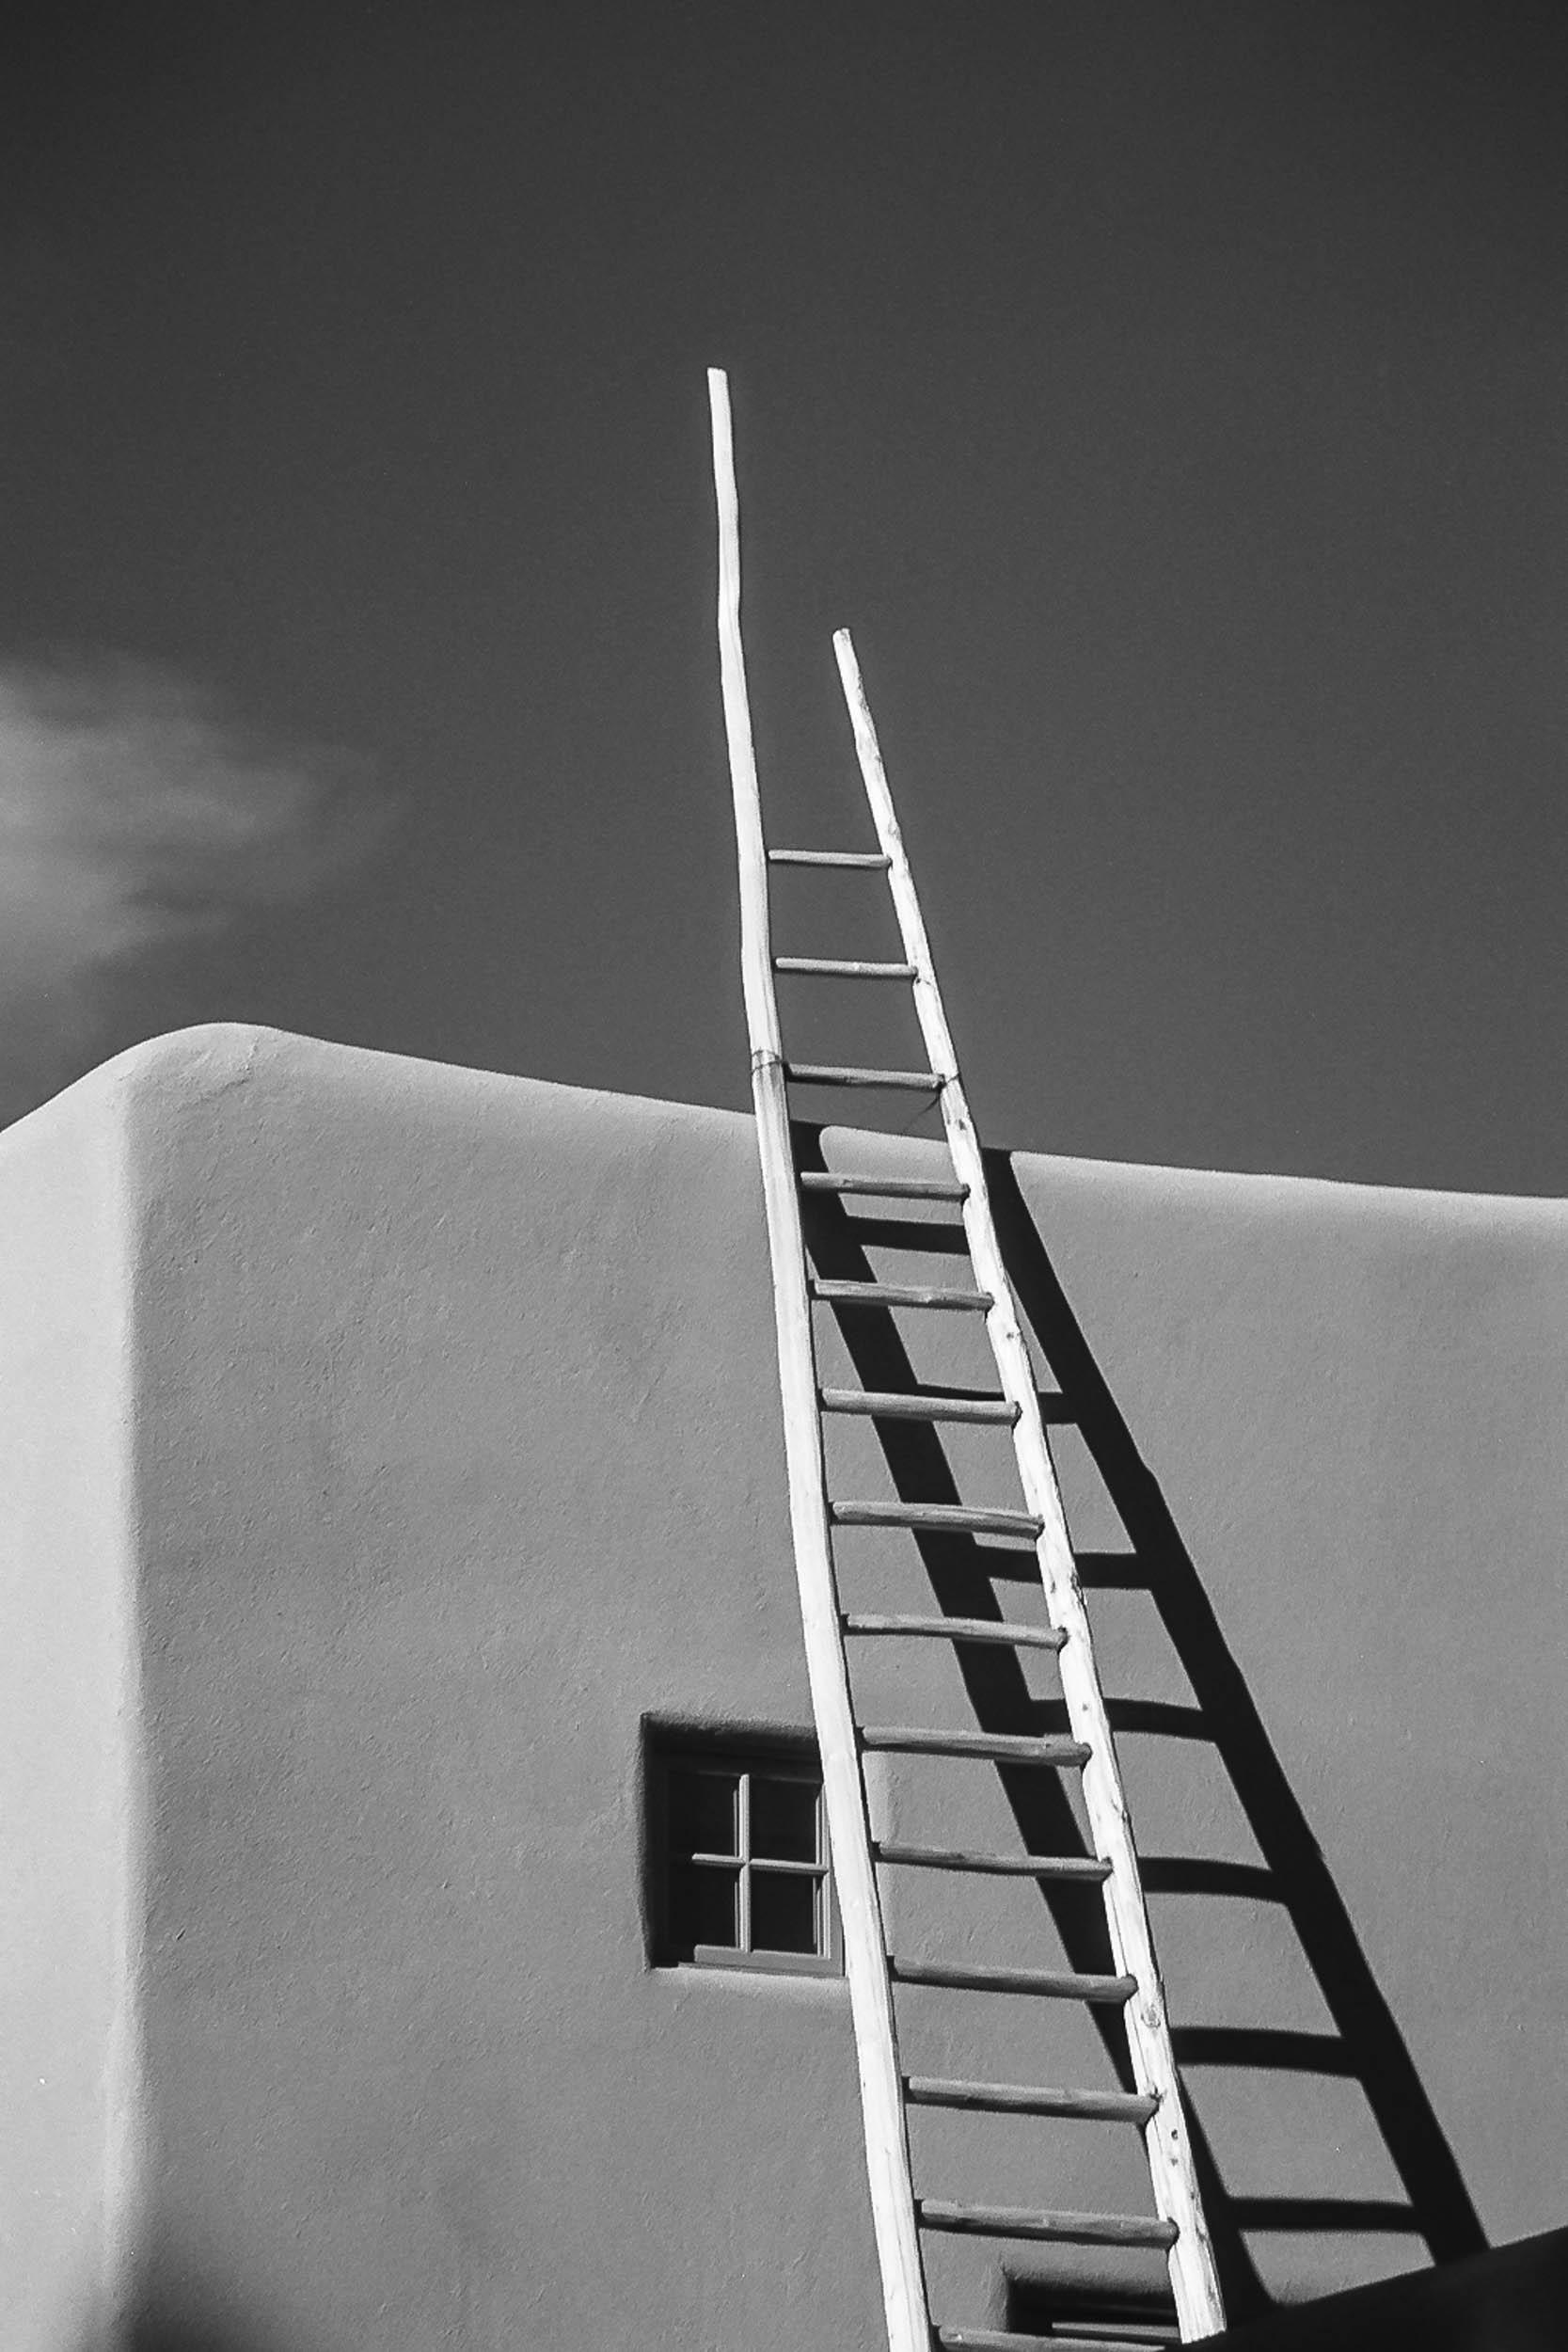 Taos-2004-DF-5.jpg